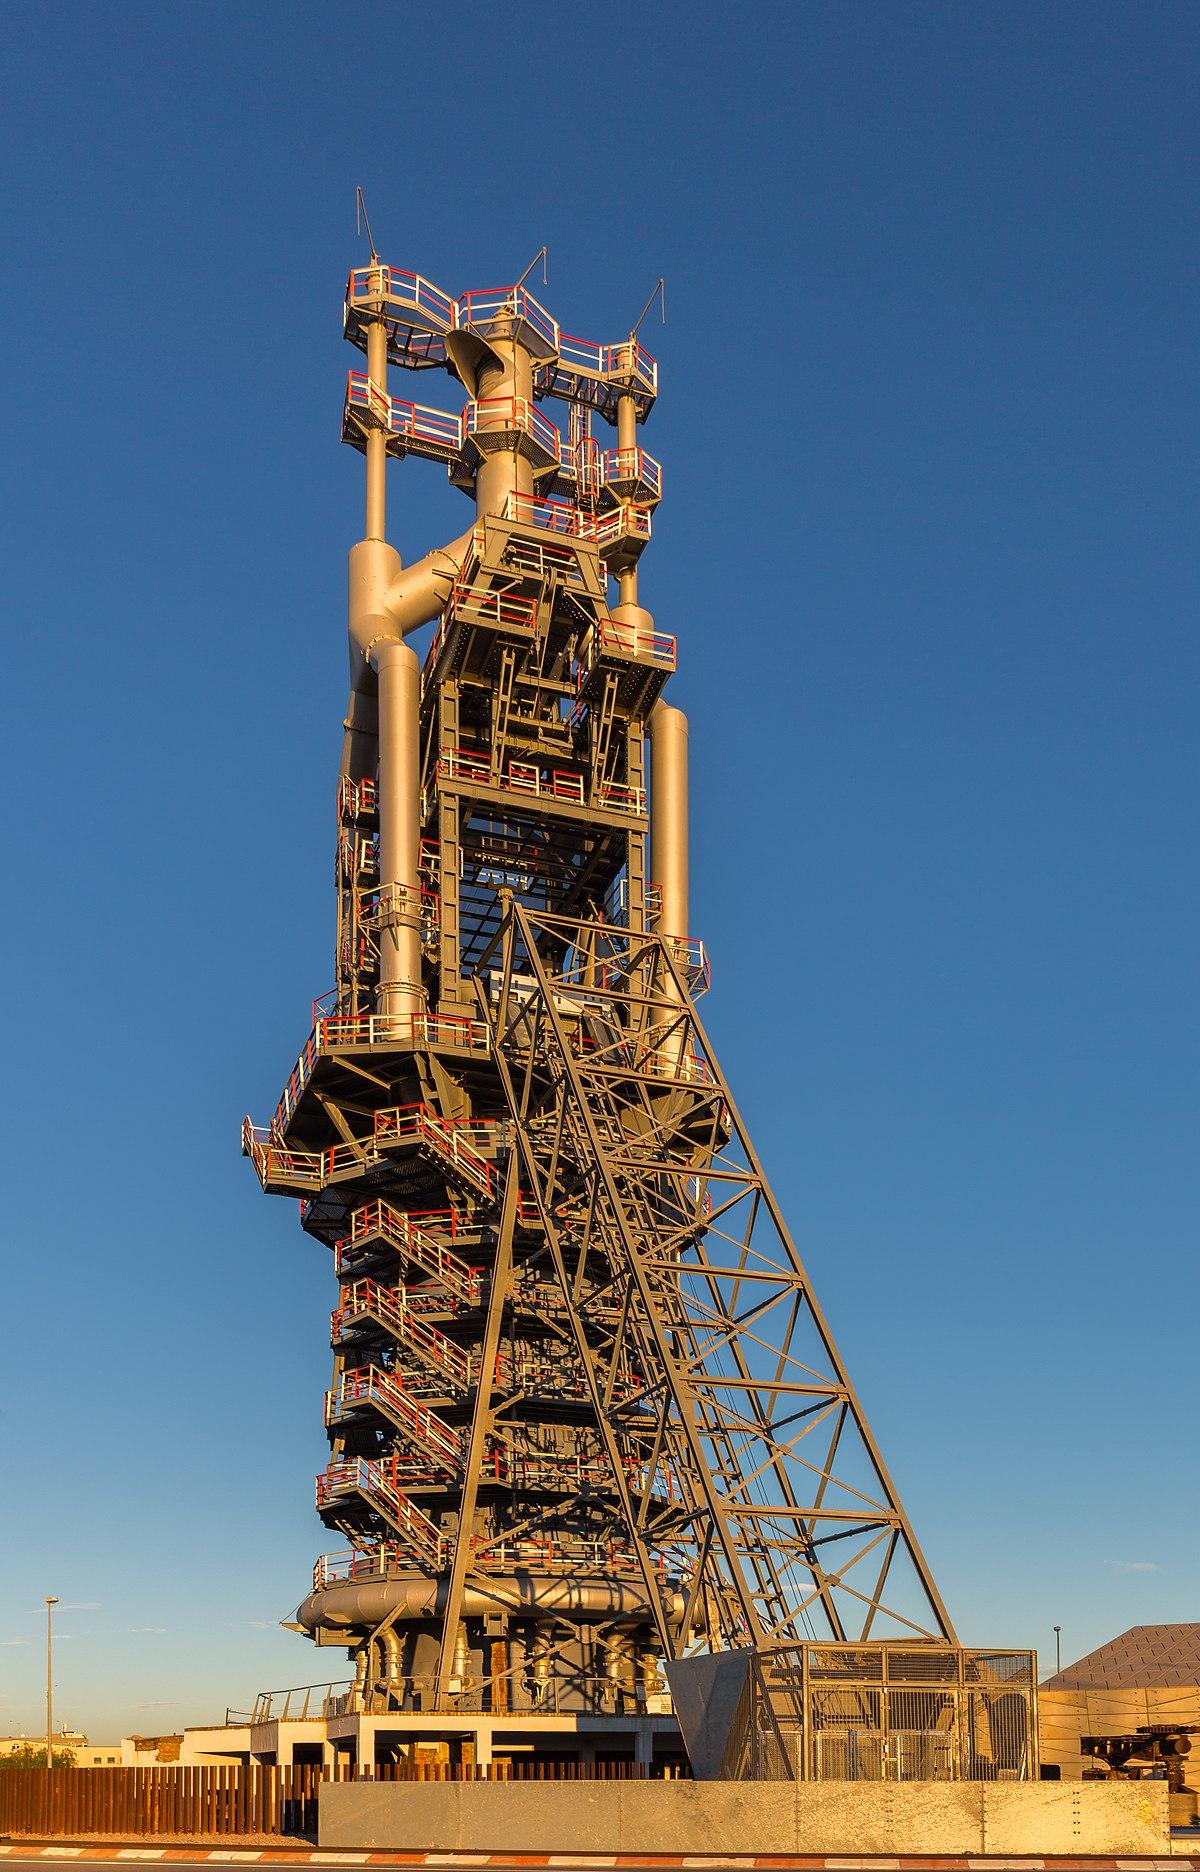 Steel industries clipart price list image free stock Blast furnace - Wikipedia image free stock